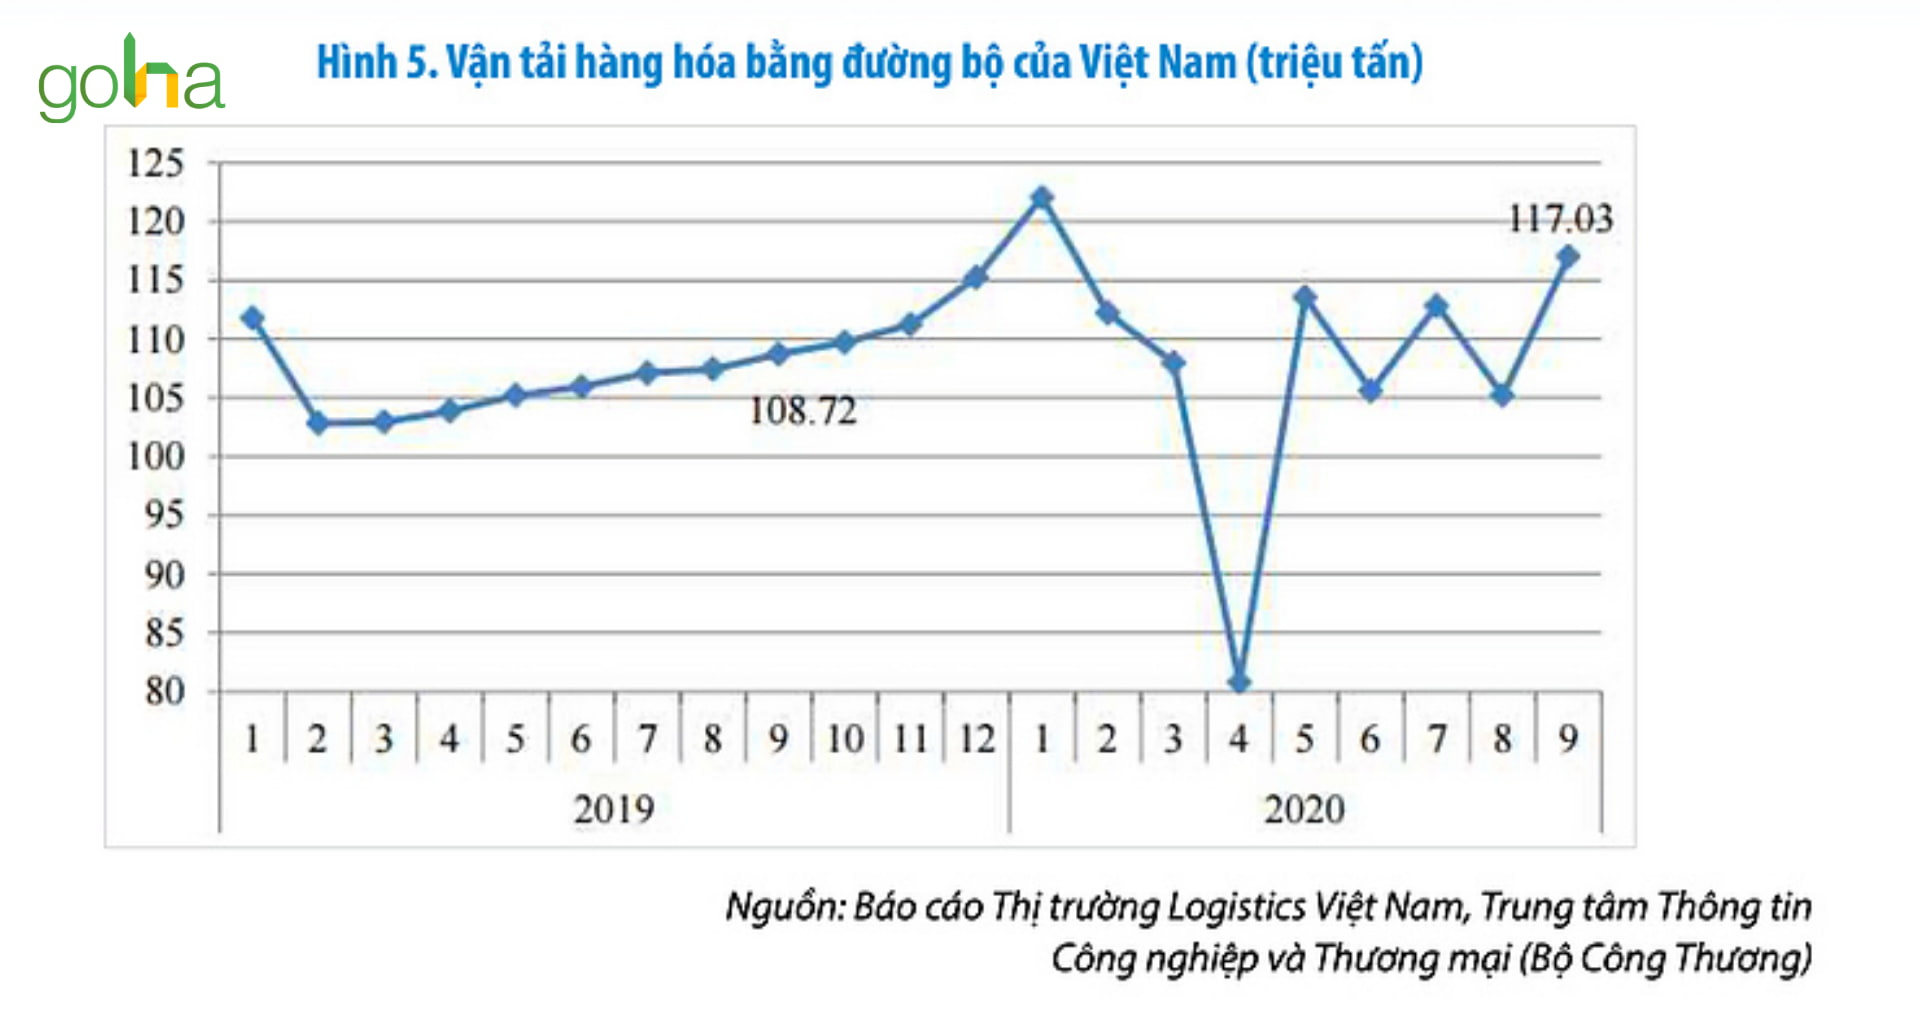 bao-cao-thi-truong-logistics-viet-nam